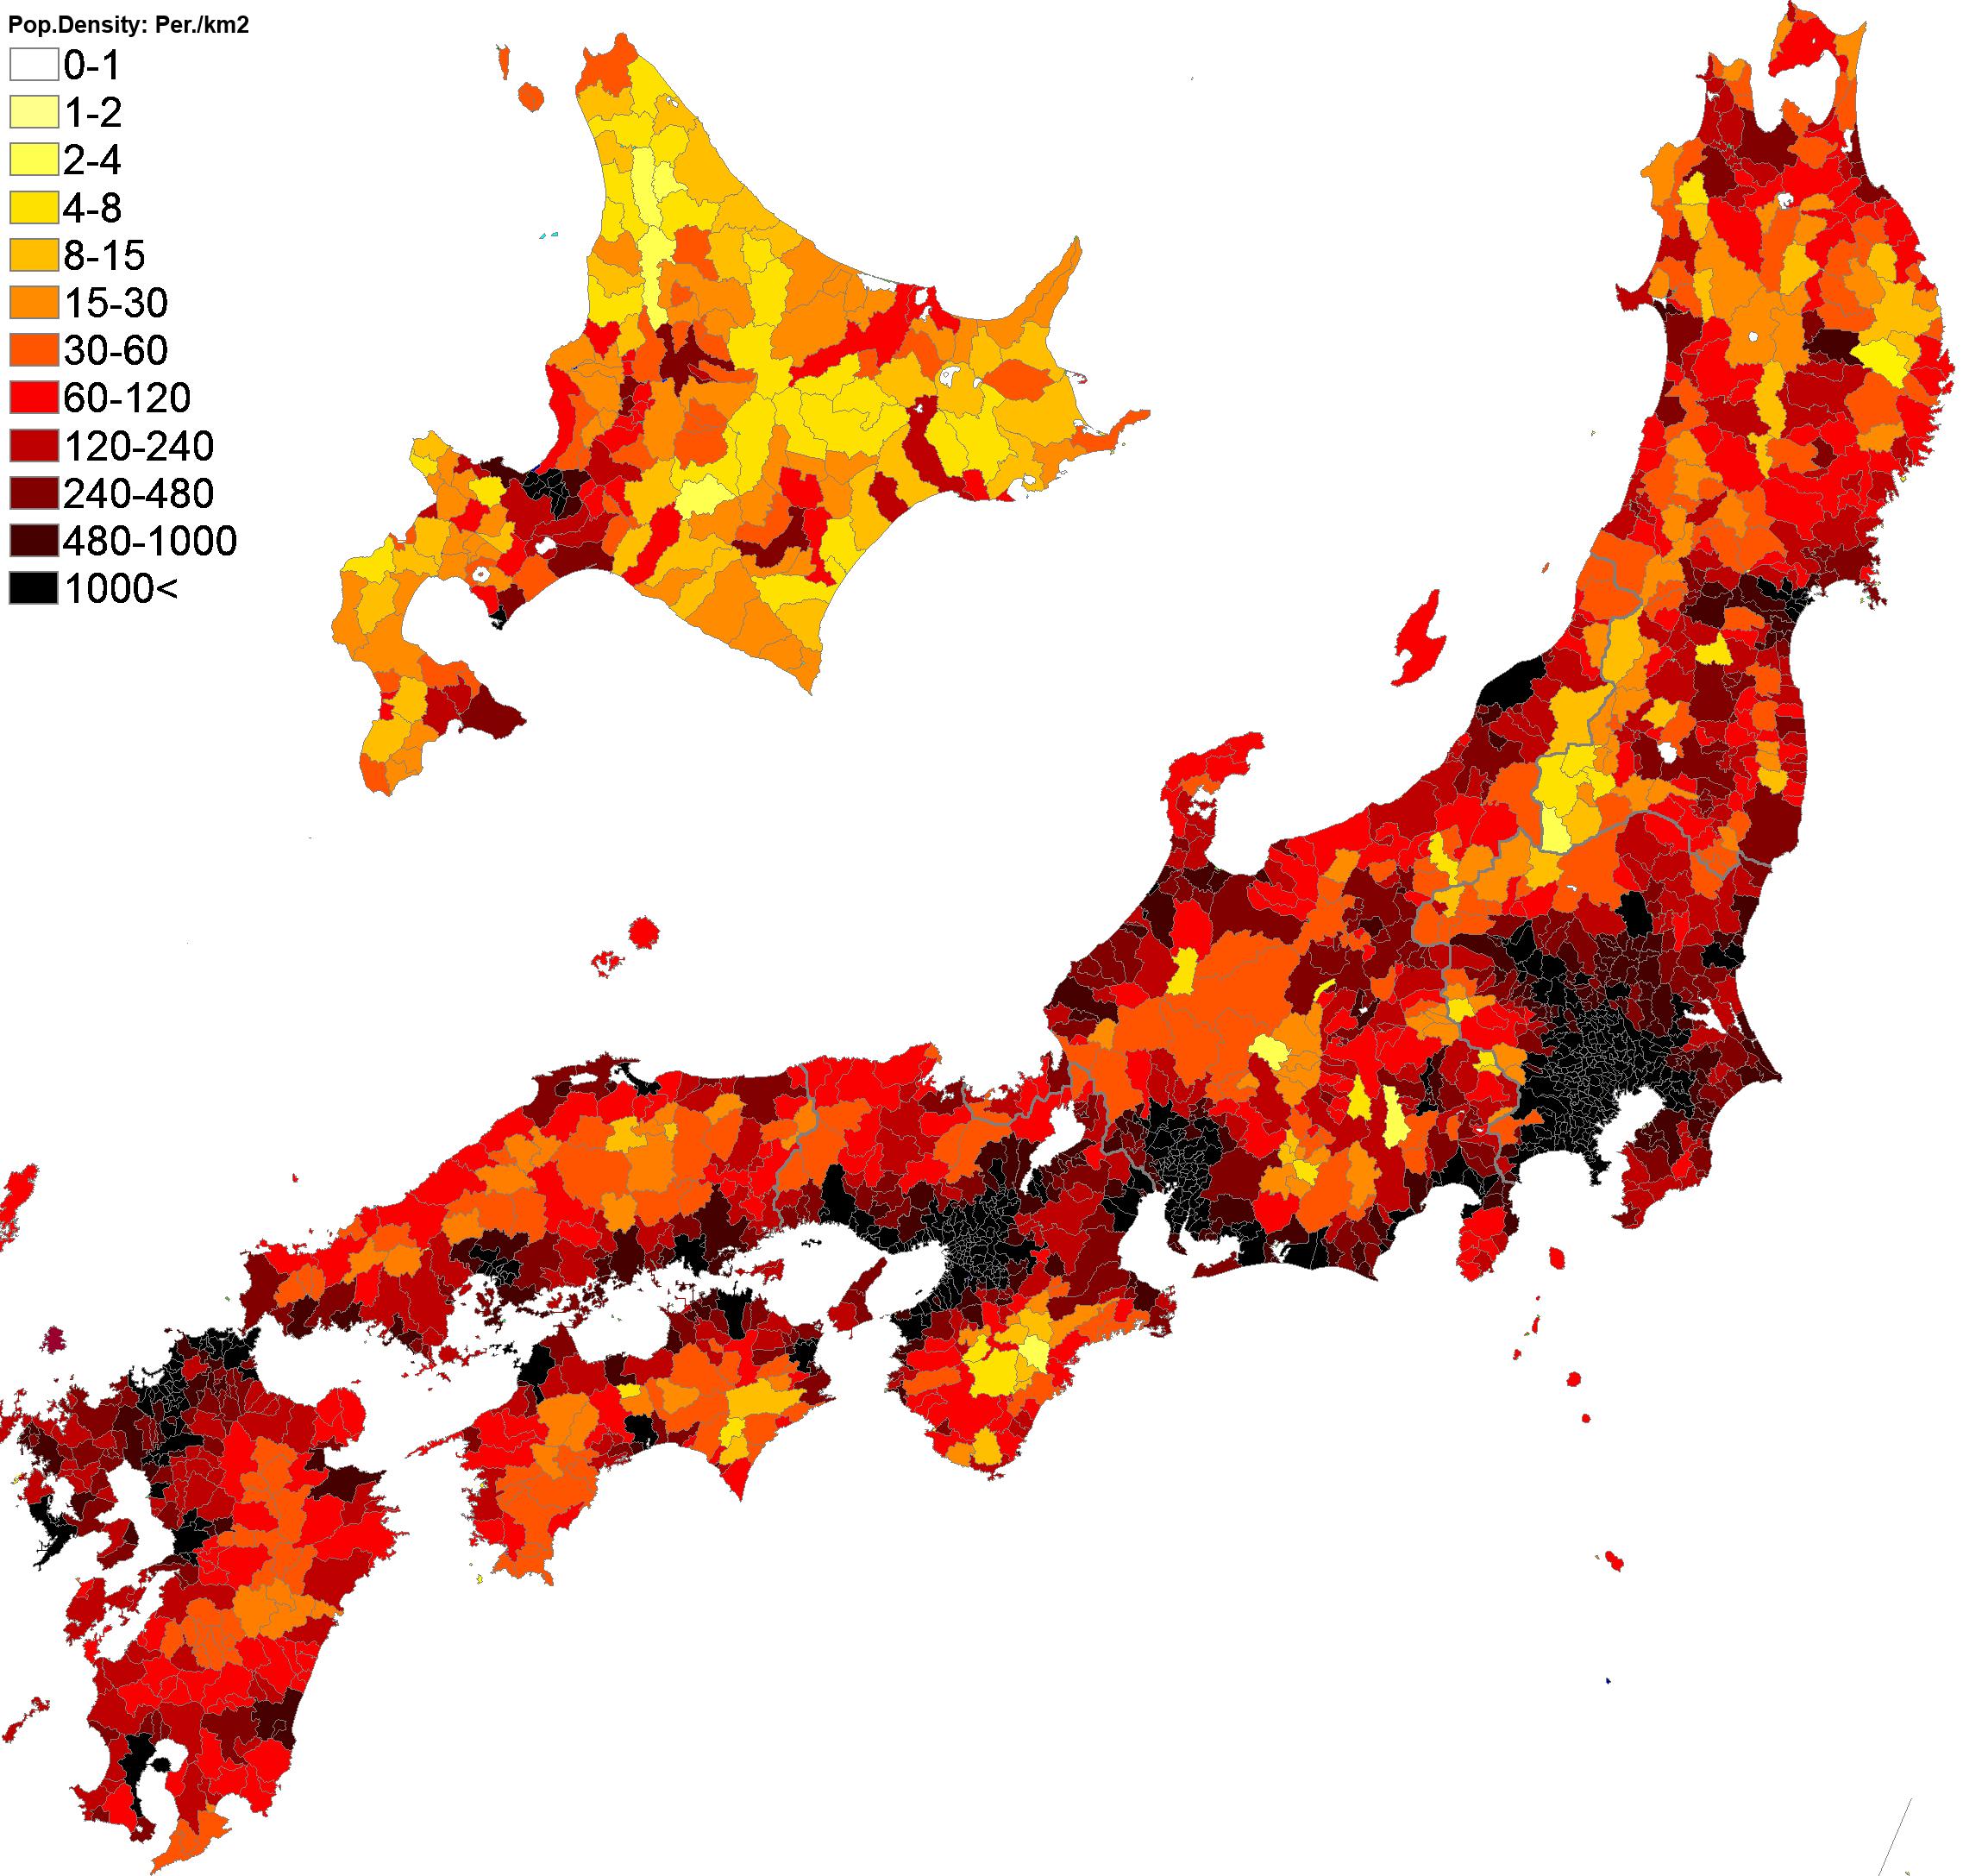 Population Density Administrative Boundaries Map Of Japan - Japan map red